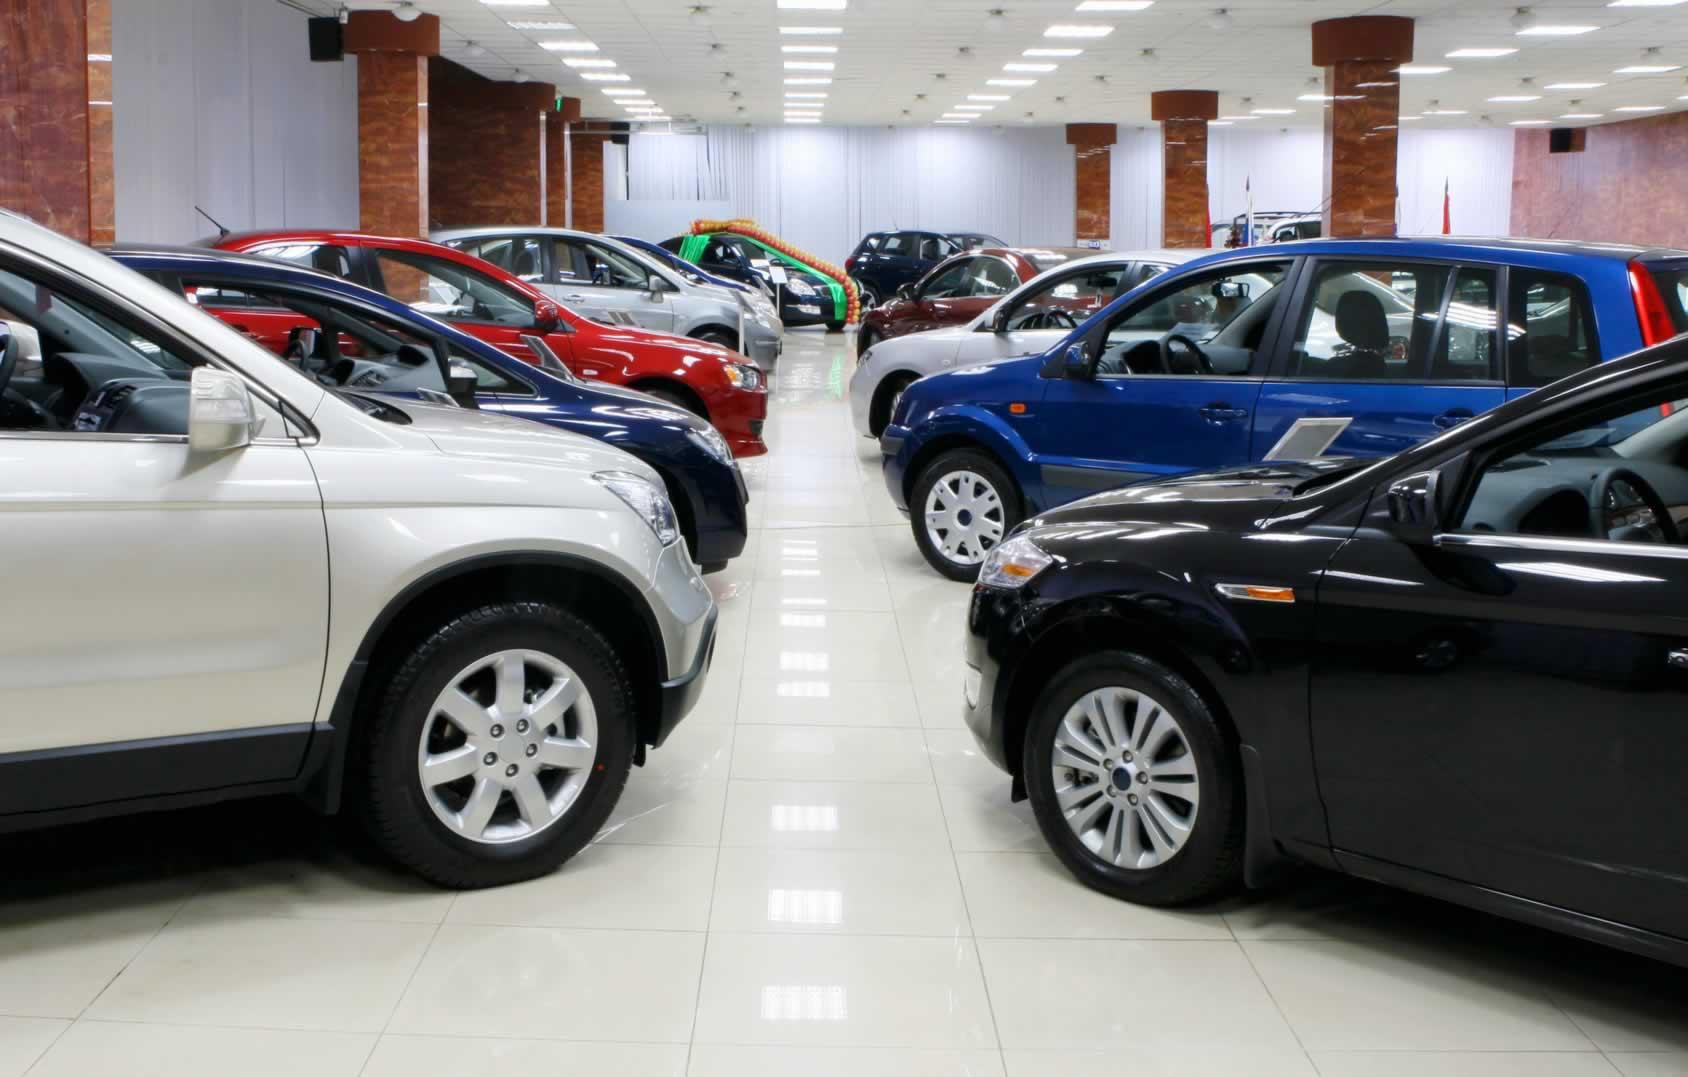 Find Best Car Dealers That Accept Bad Credit